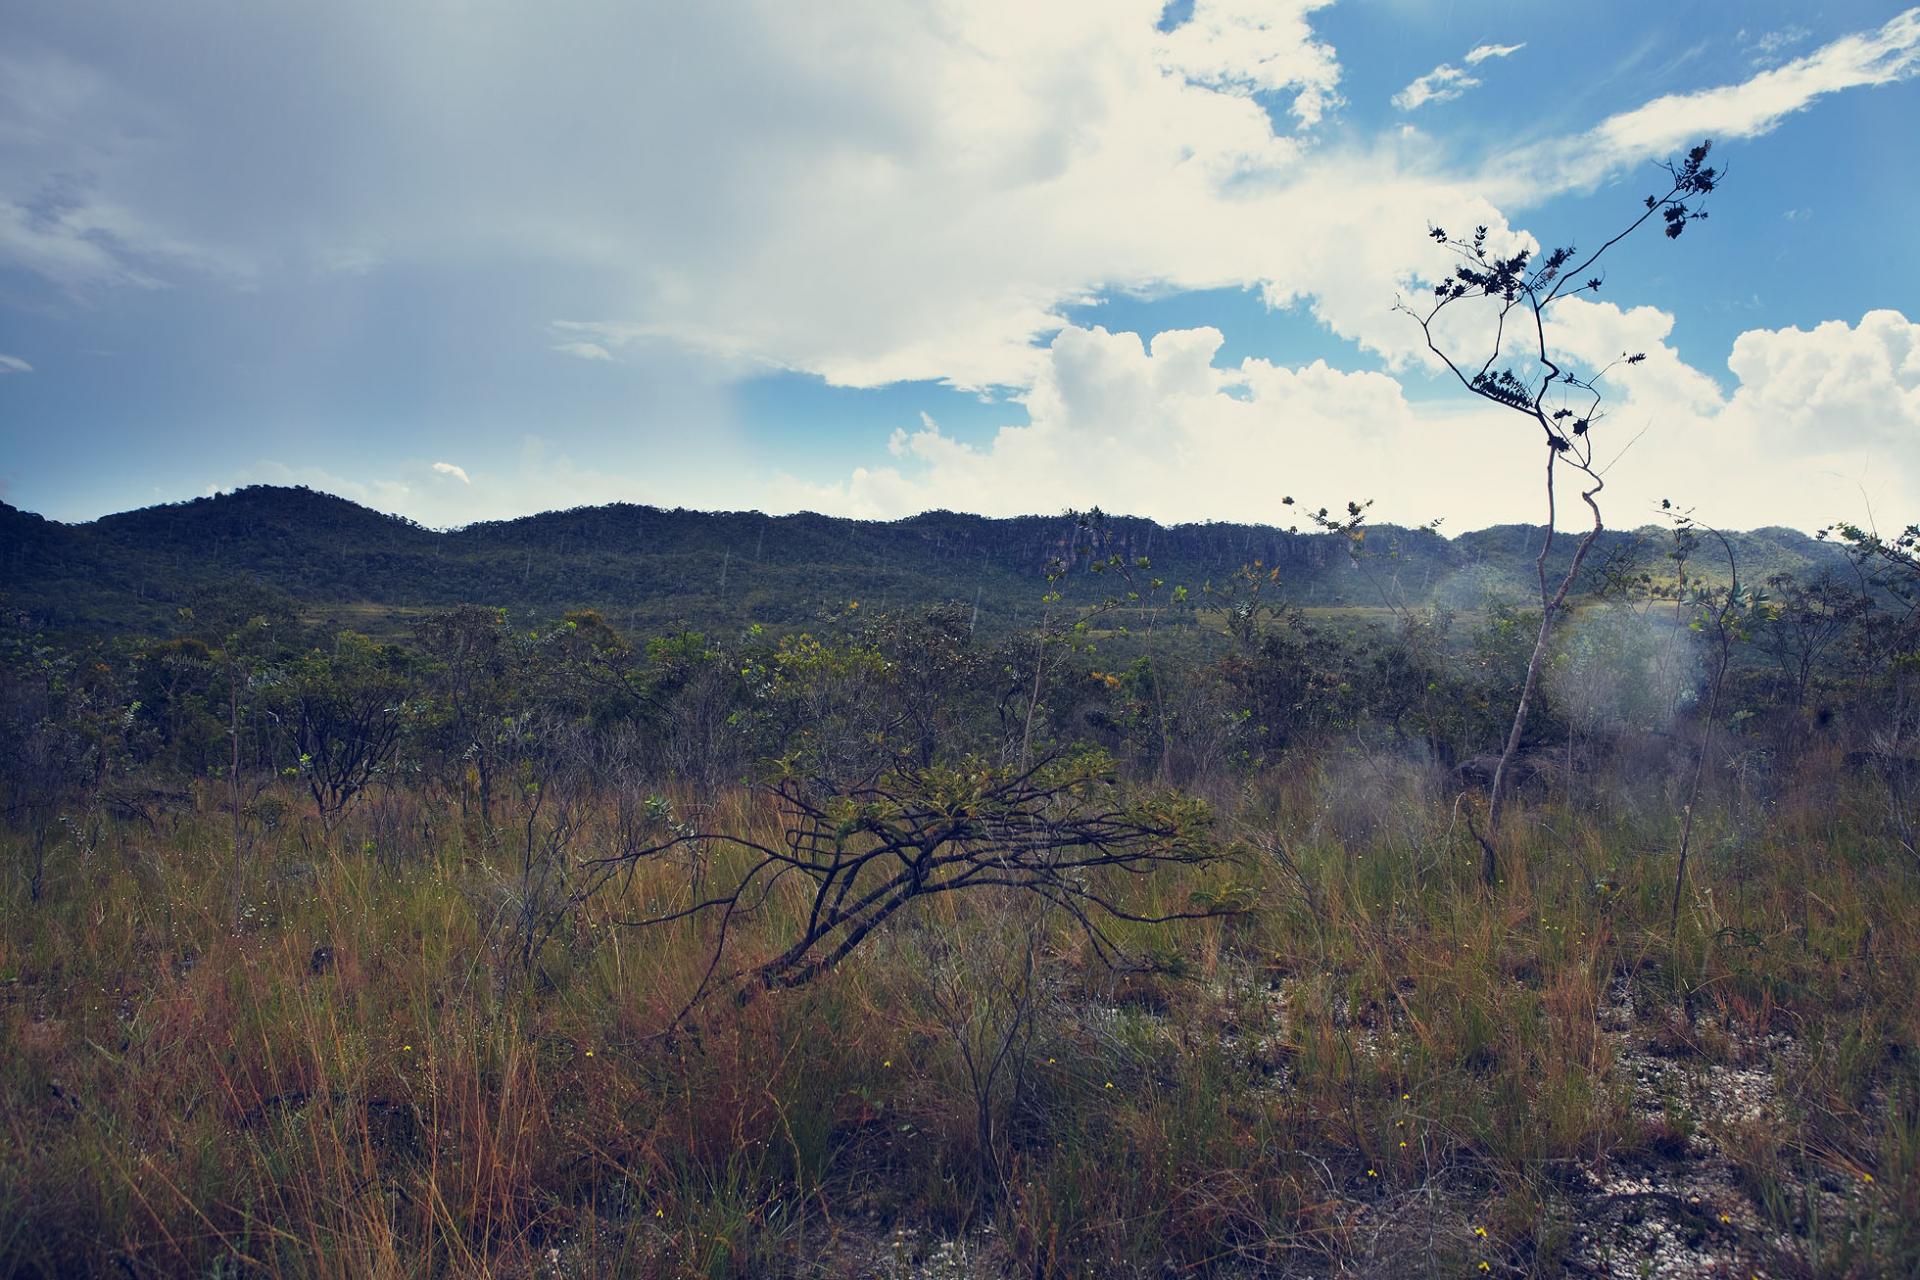 Lukas Gaechter travel/landscape